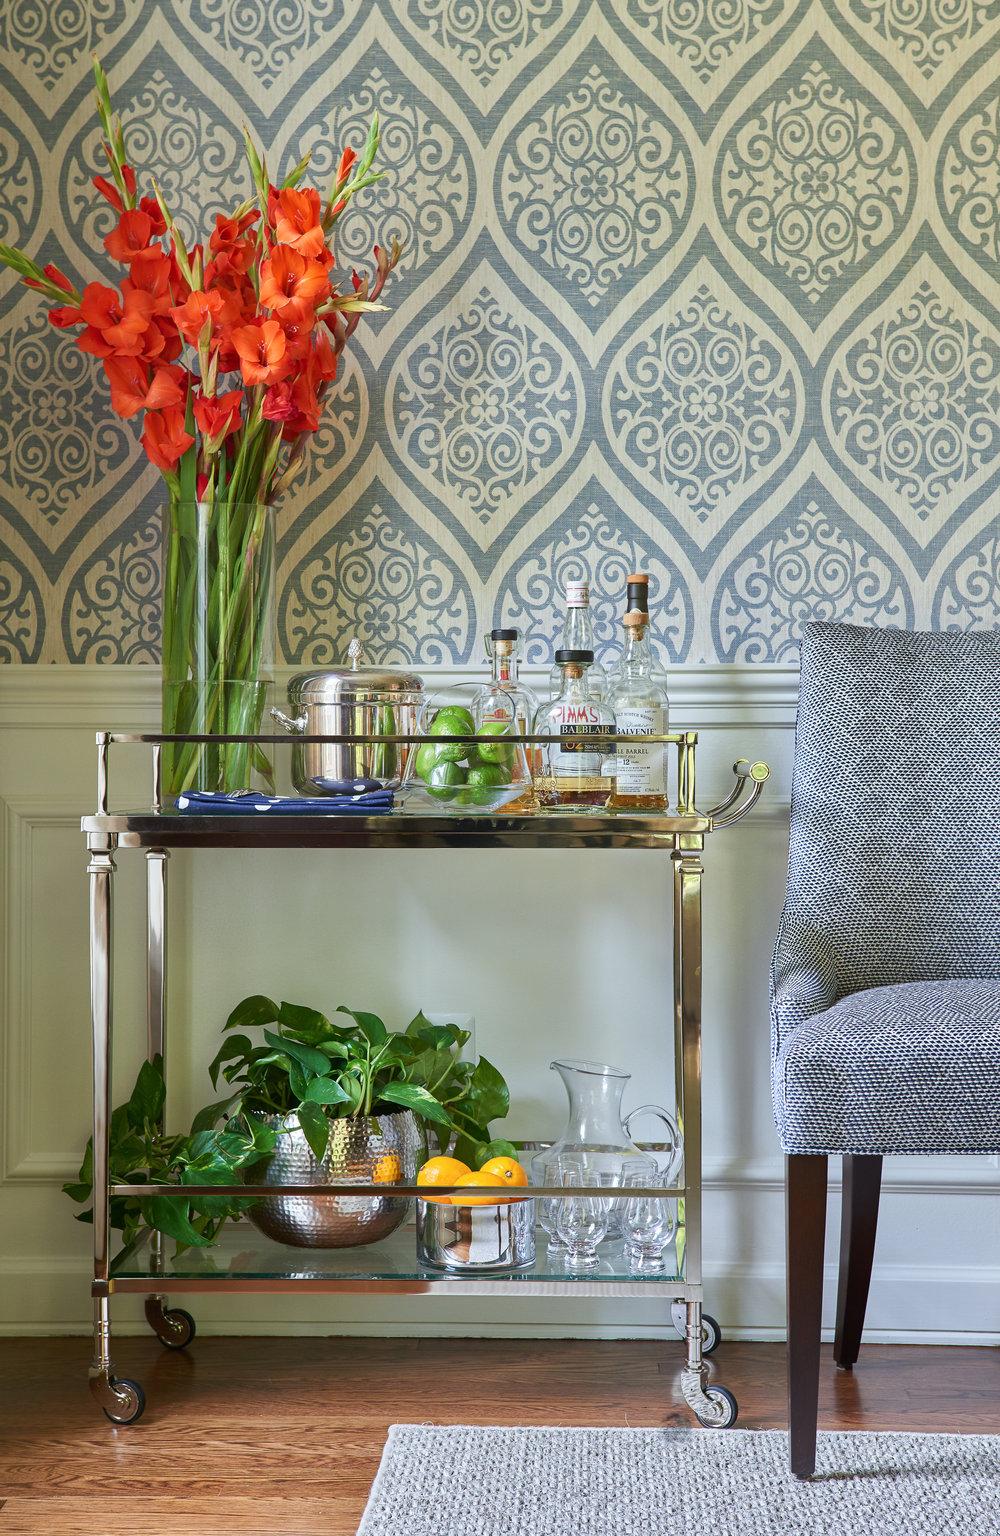 Bar Cart and Geometric Wallpaper